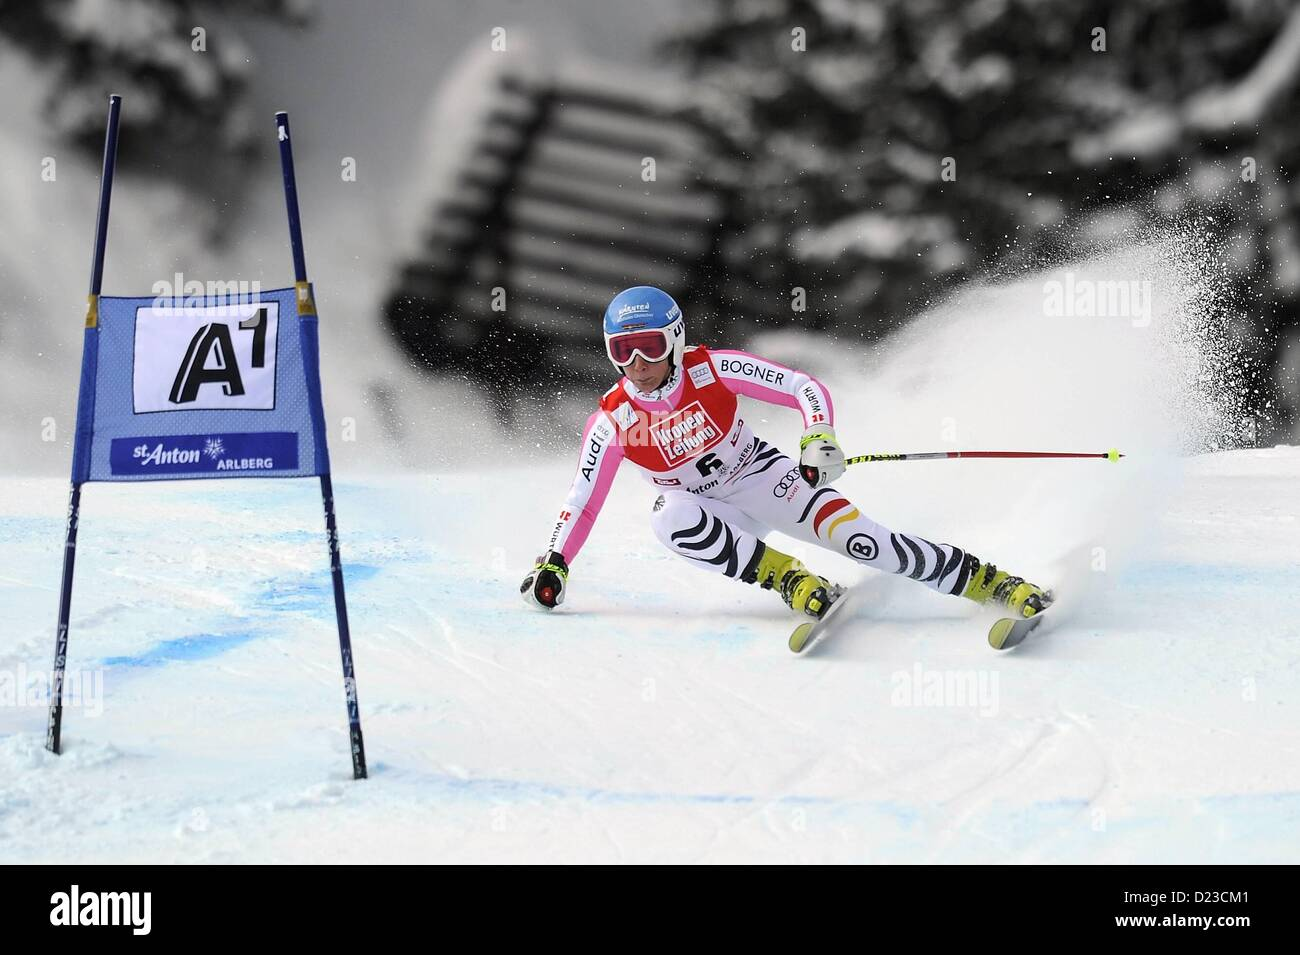 St Anton, Austria. 13th Jan, 2013.   Ski Alpine FIS World Cup Super G for women Veronique  GER - Stock Image